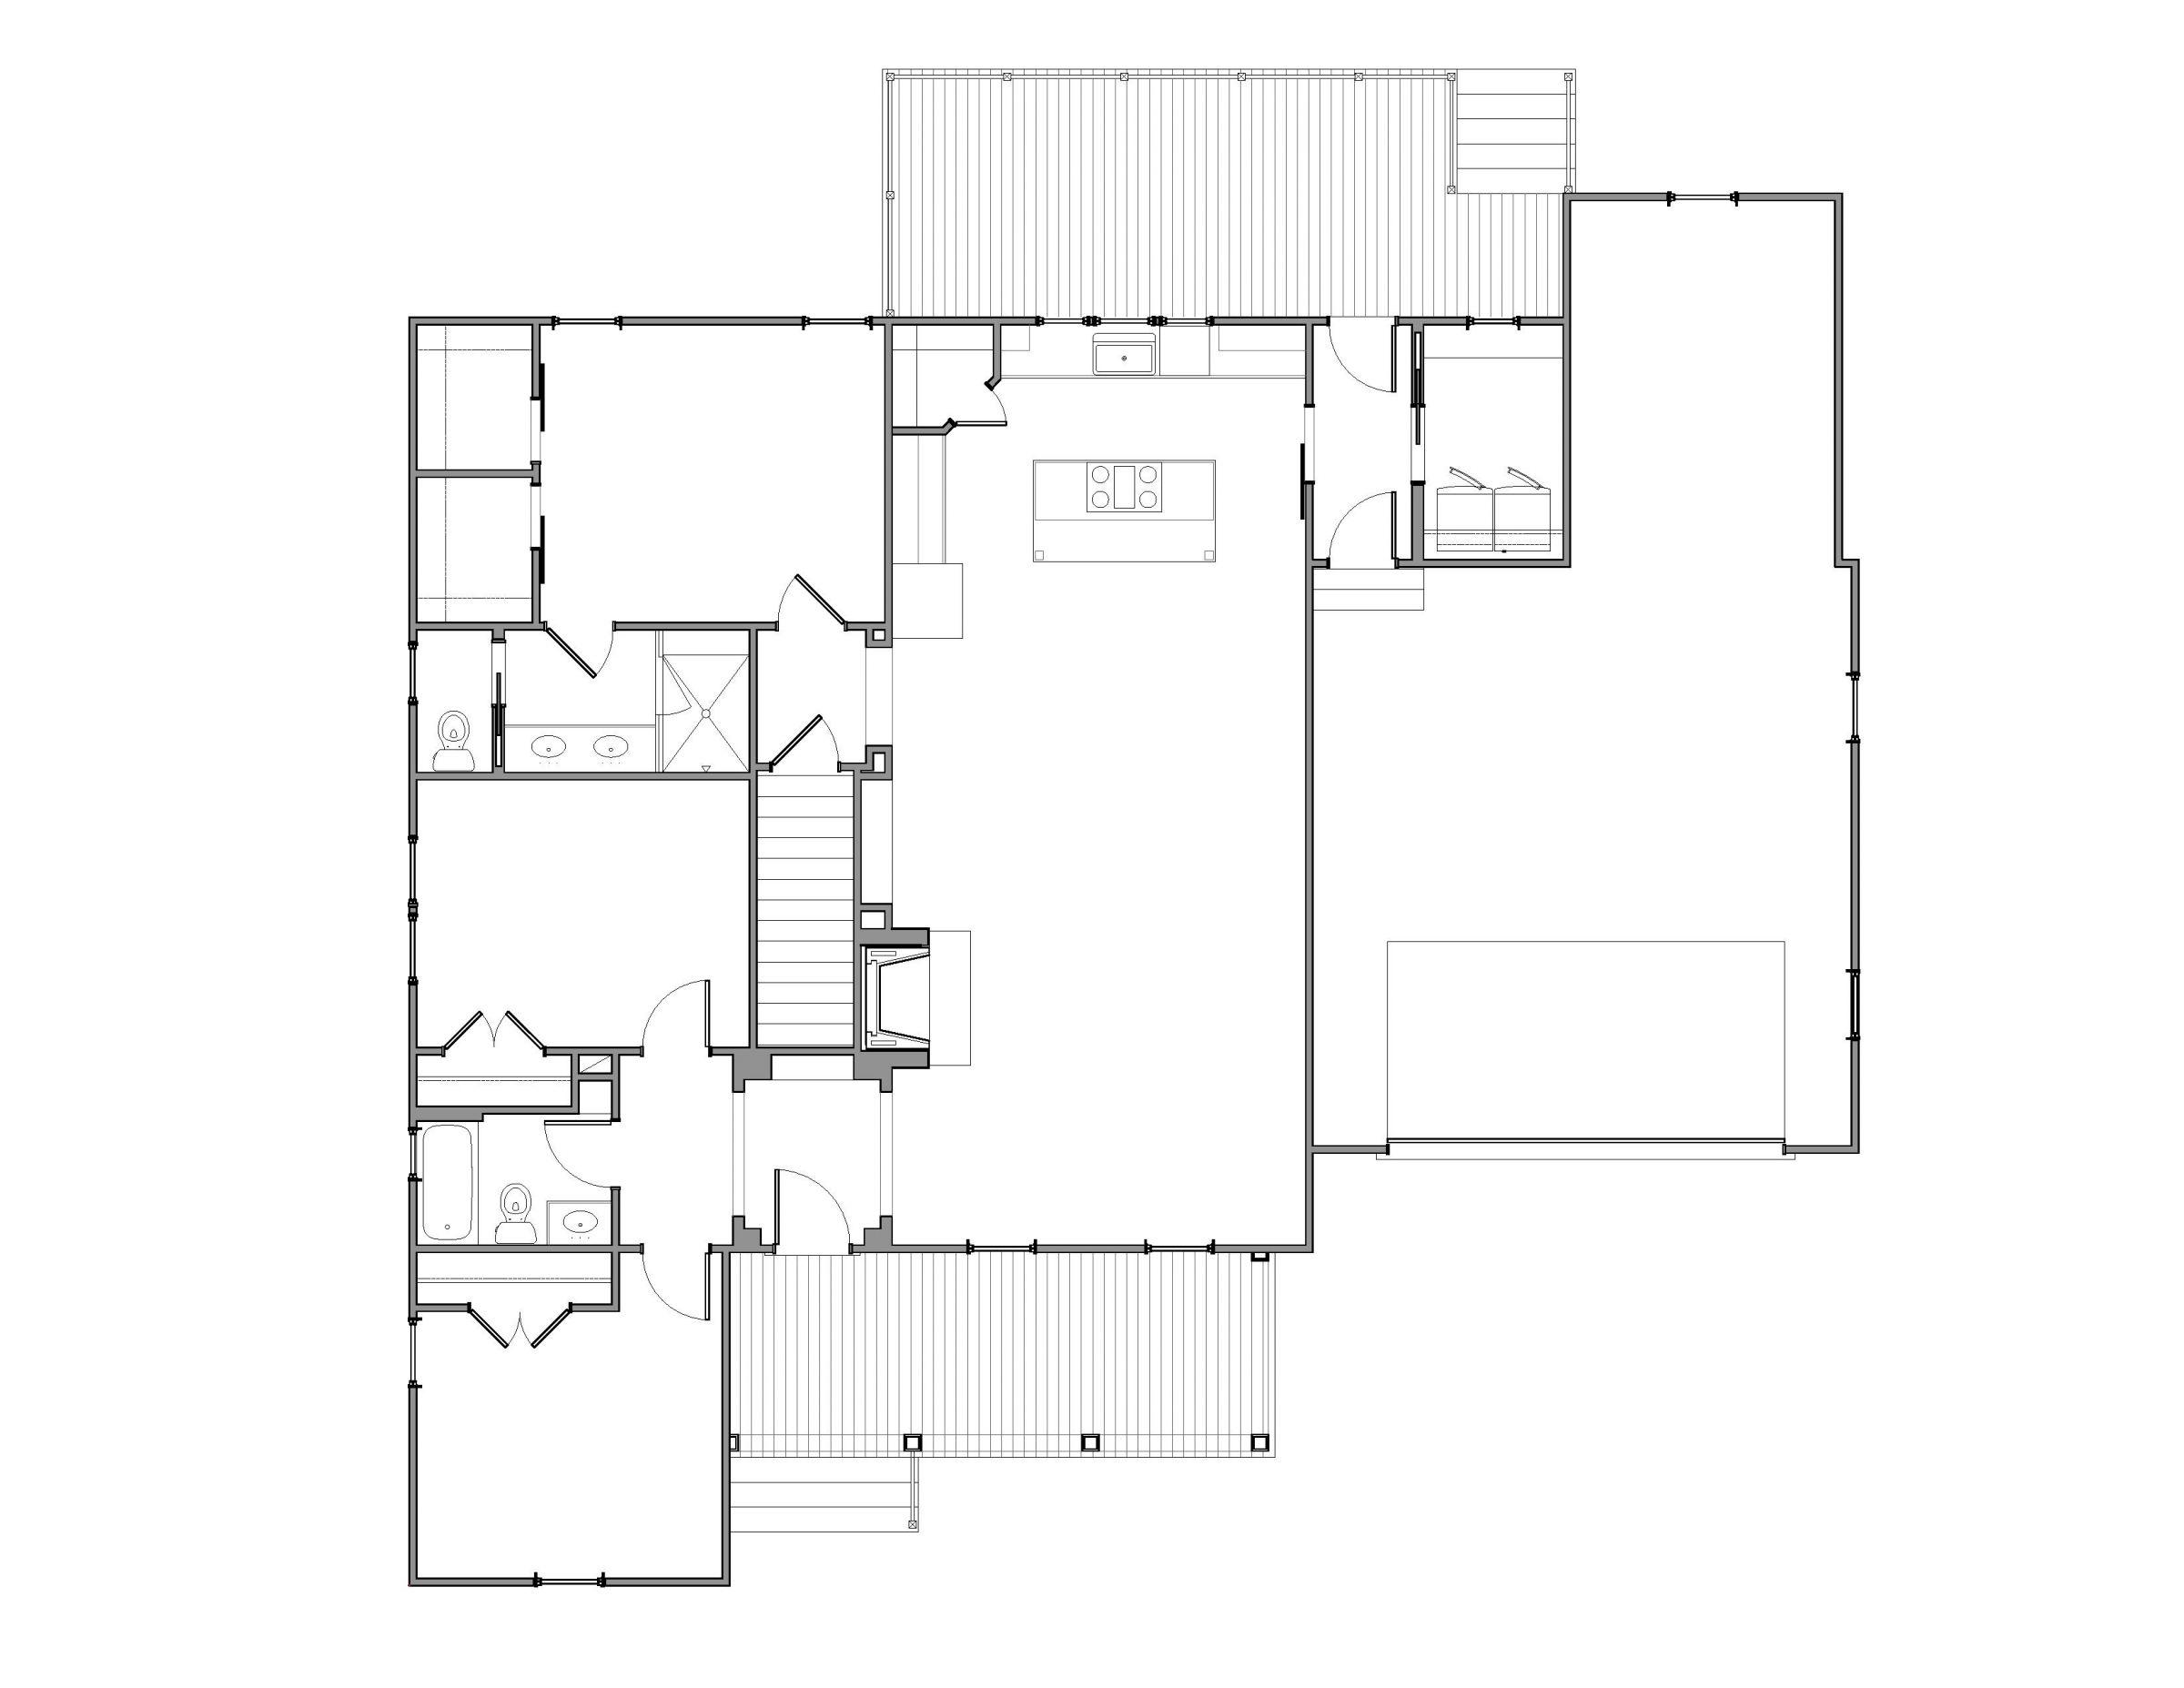 residential-warren-county-iowa-0-acres-listing-number-15610-0-2021-06-23-182812.jpg